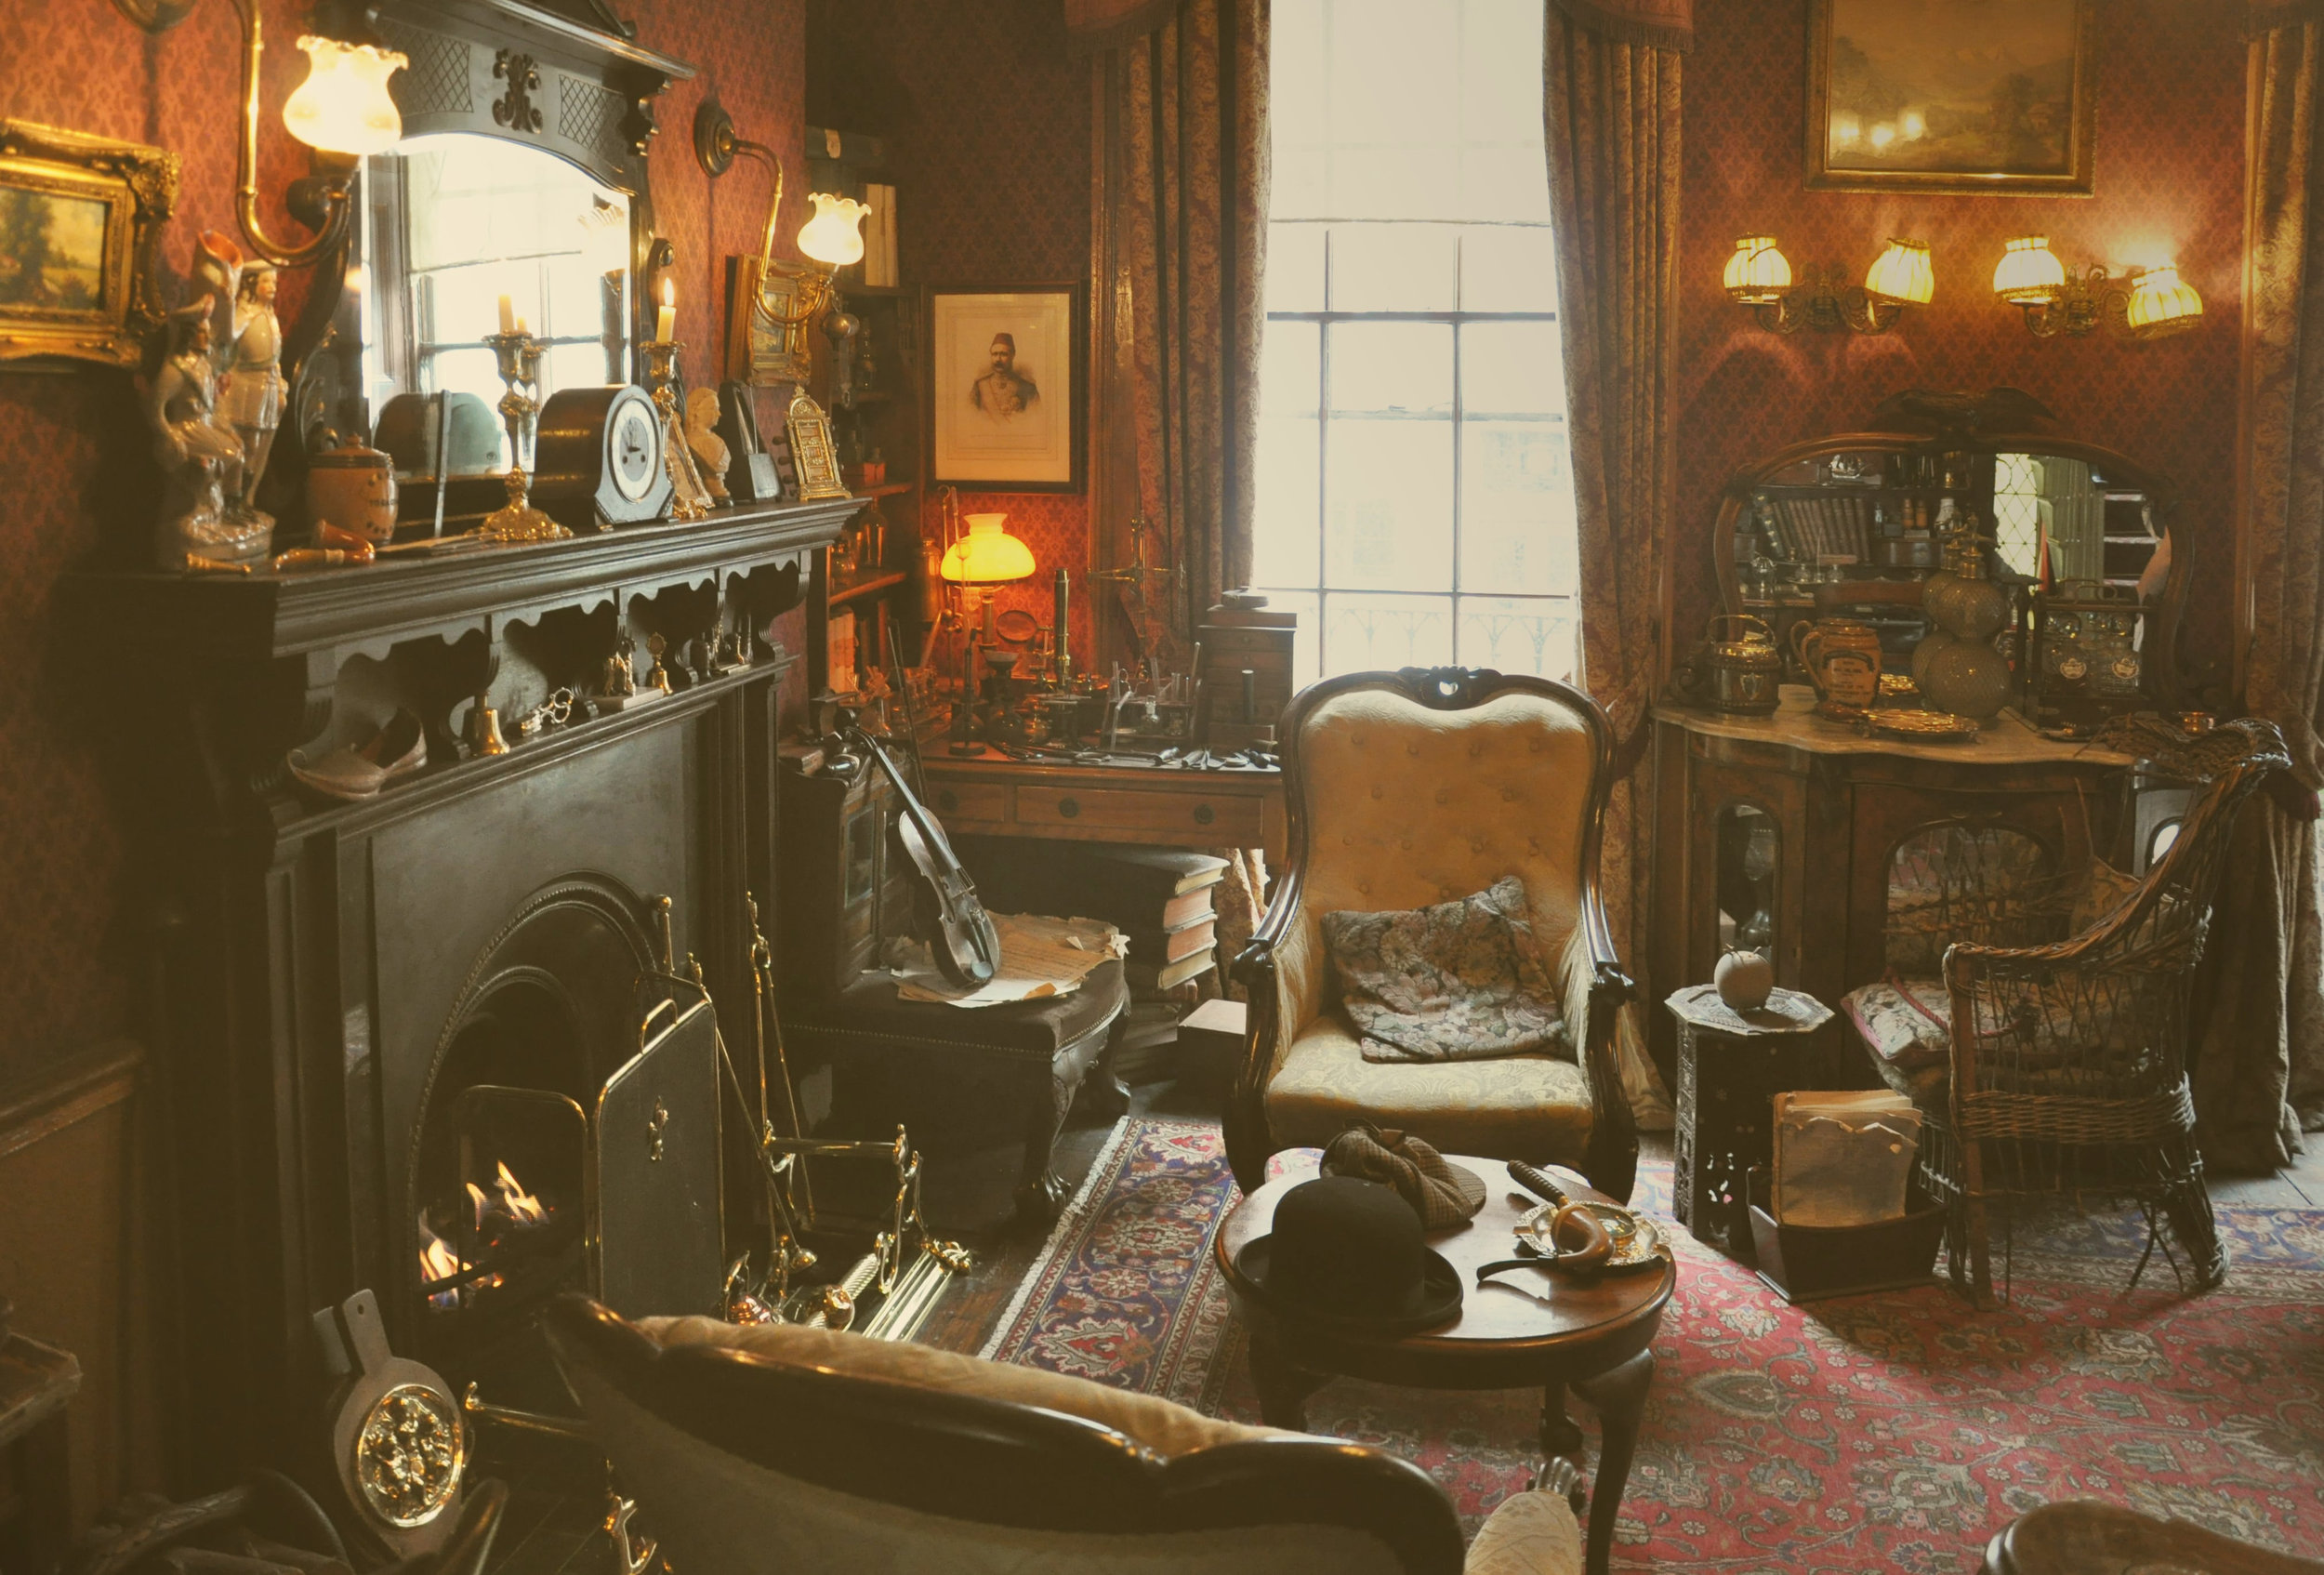 Source: London, England -- The Interior of 221 B Baker Street.